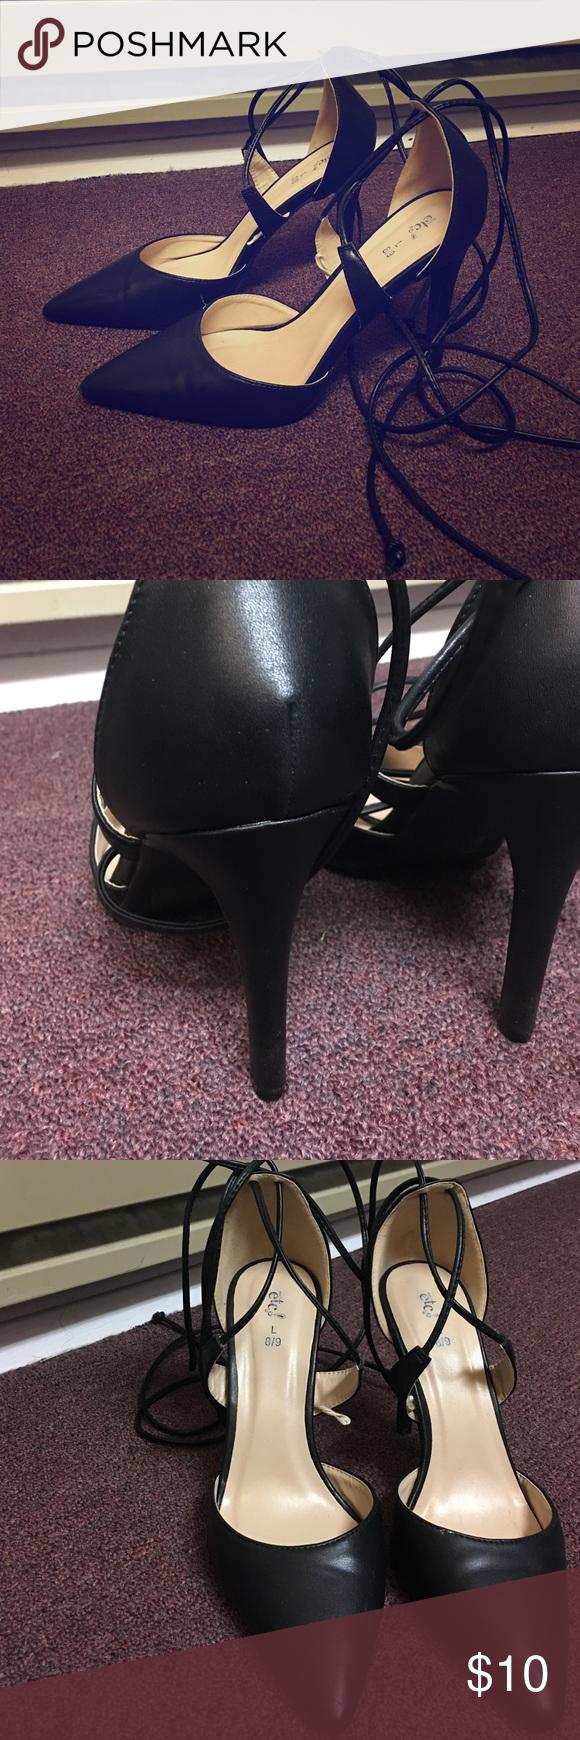 Tie Up Pointy Pumps Black Heels, Cute, Barely Worn, In Great Shape Rue 21 Shoes Heels